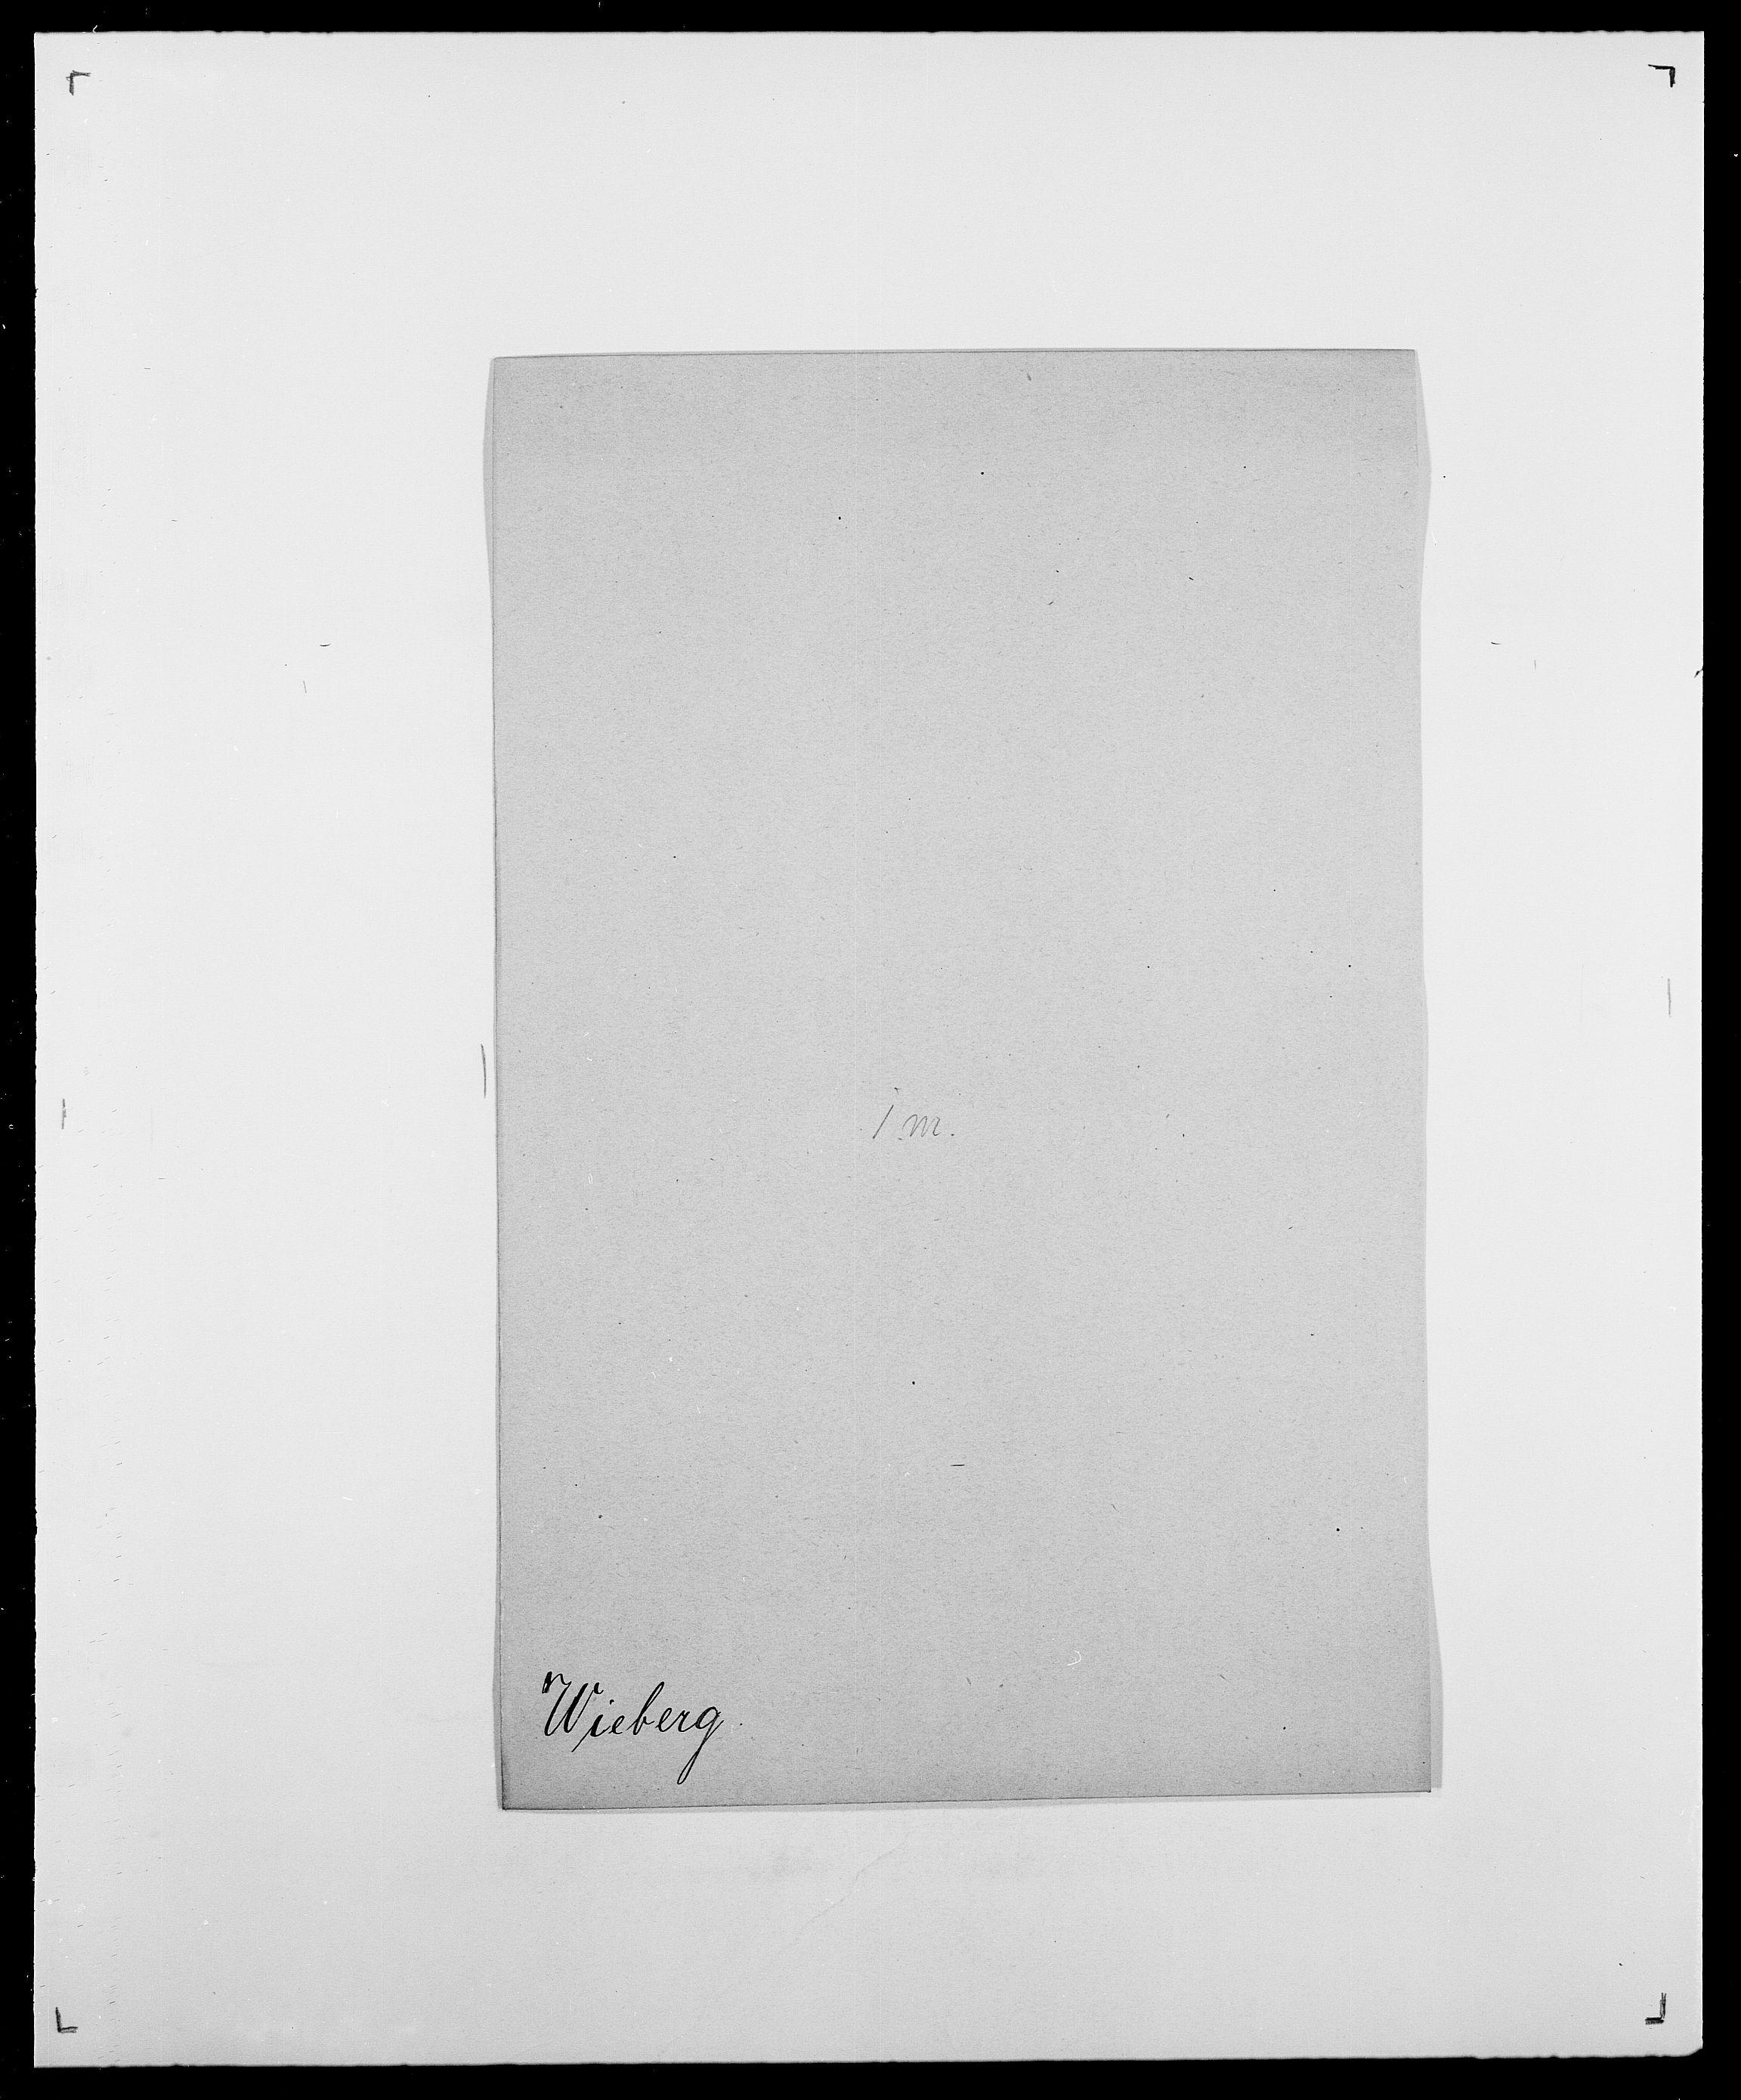 SAO, Delgobe, Charles Antoine - samling, D/Da/L0041: Vemmestad - Viker, s. 480